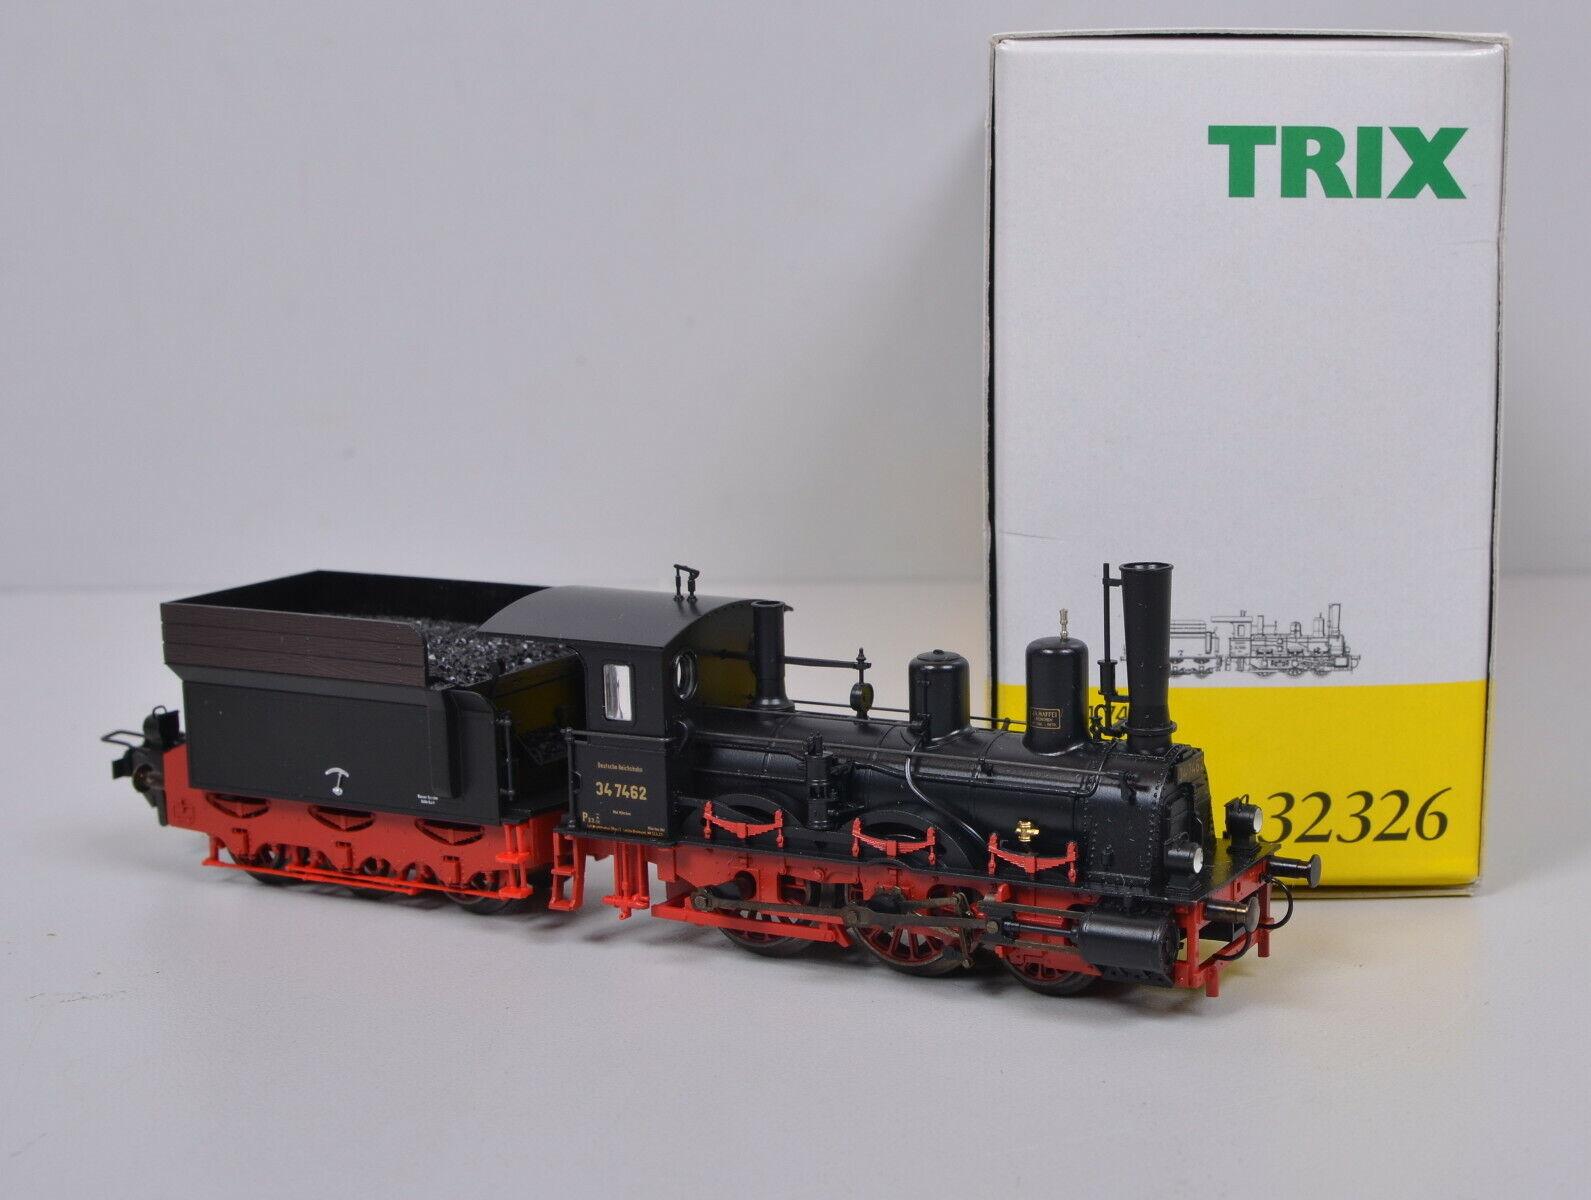 Trix Express 32326 vapor Coche 34 7462 DR     unbessielt   CONF 91b